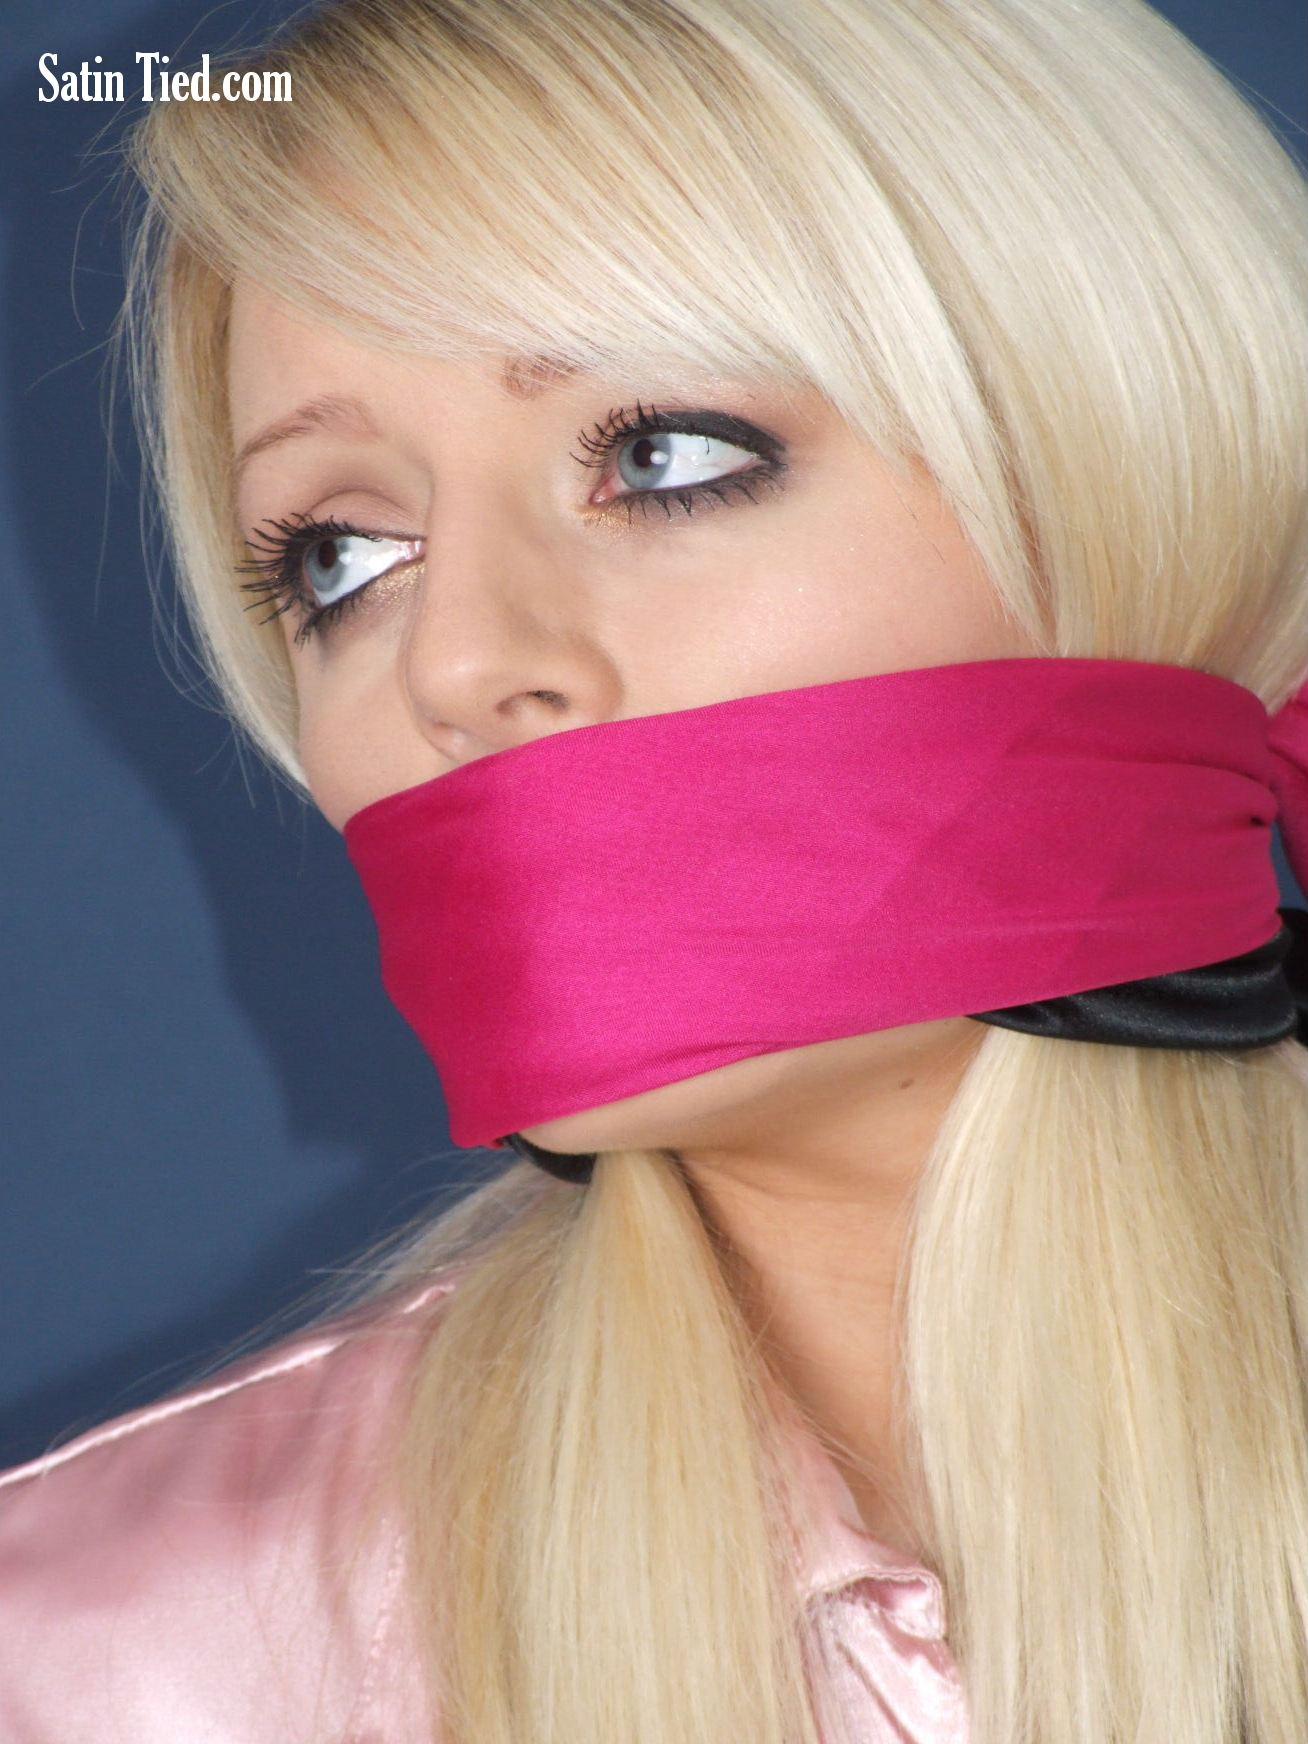 Satin Tied: Hannah in Pink Satin 2